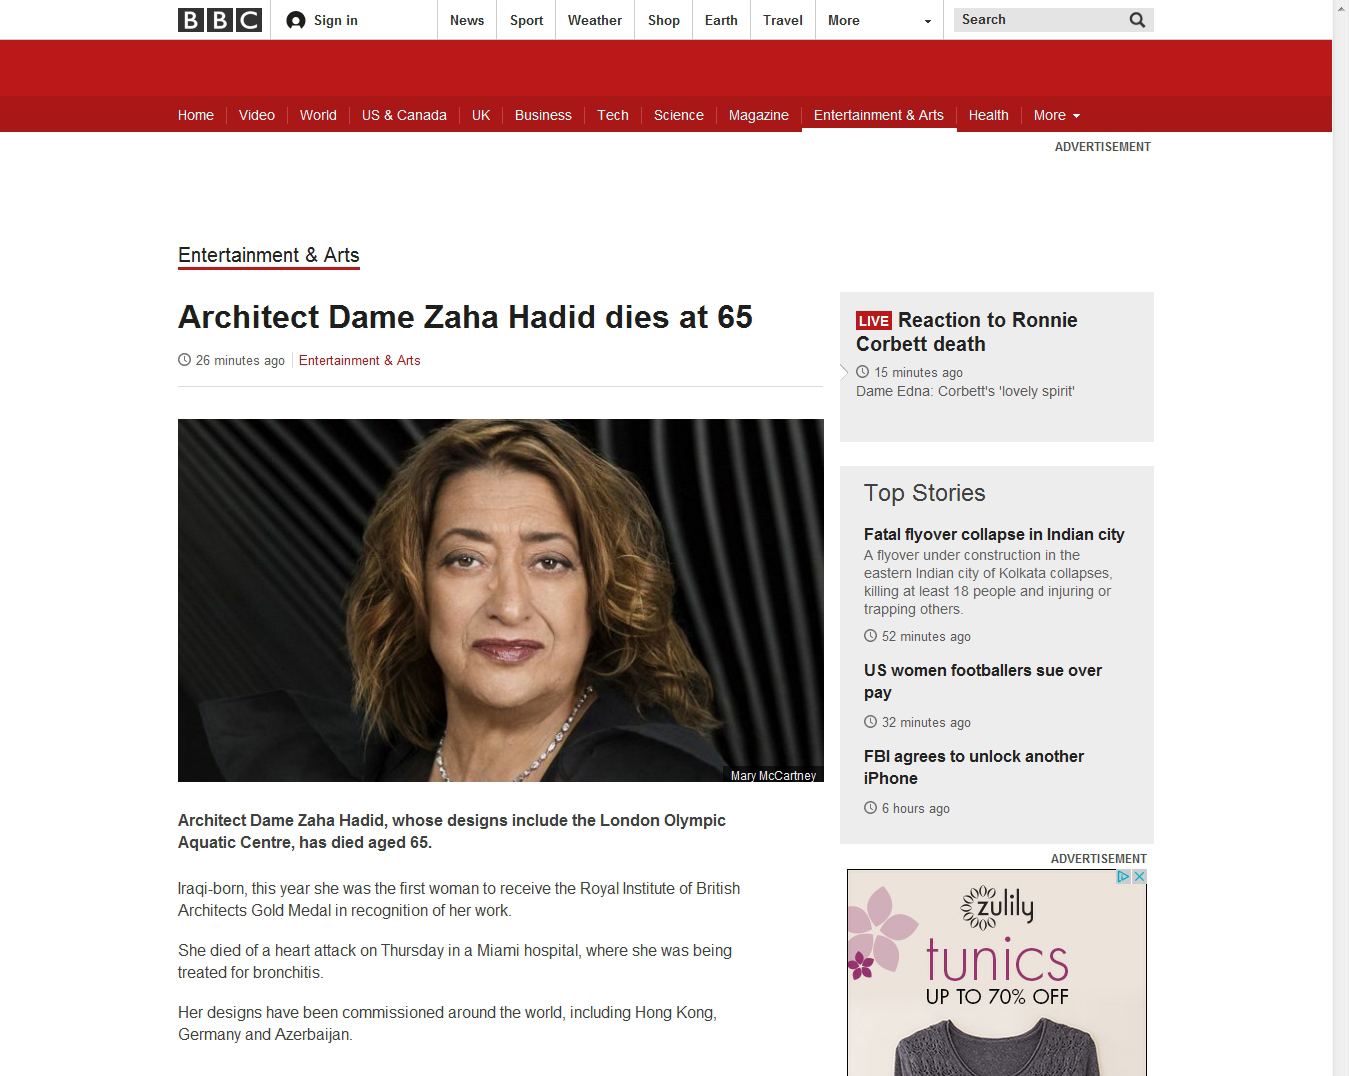 Architect Dame Zaha Hadid dies at 65 - BBC News